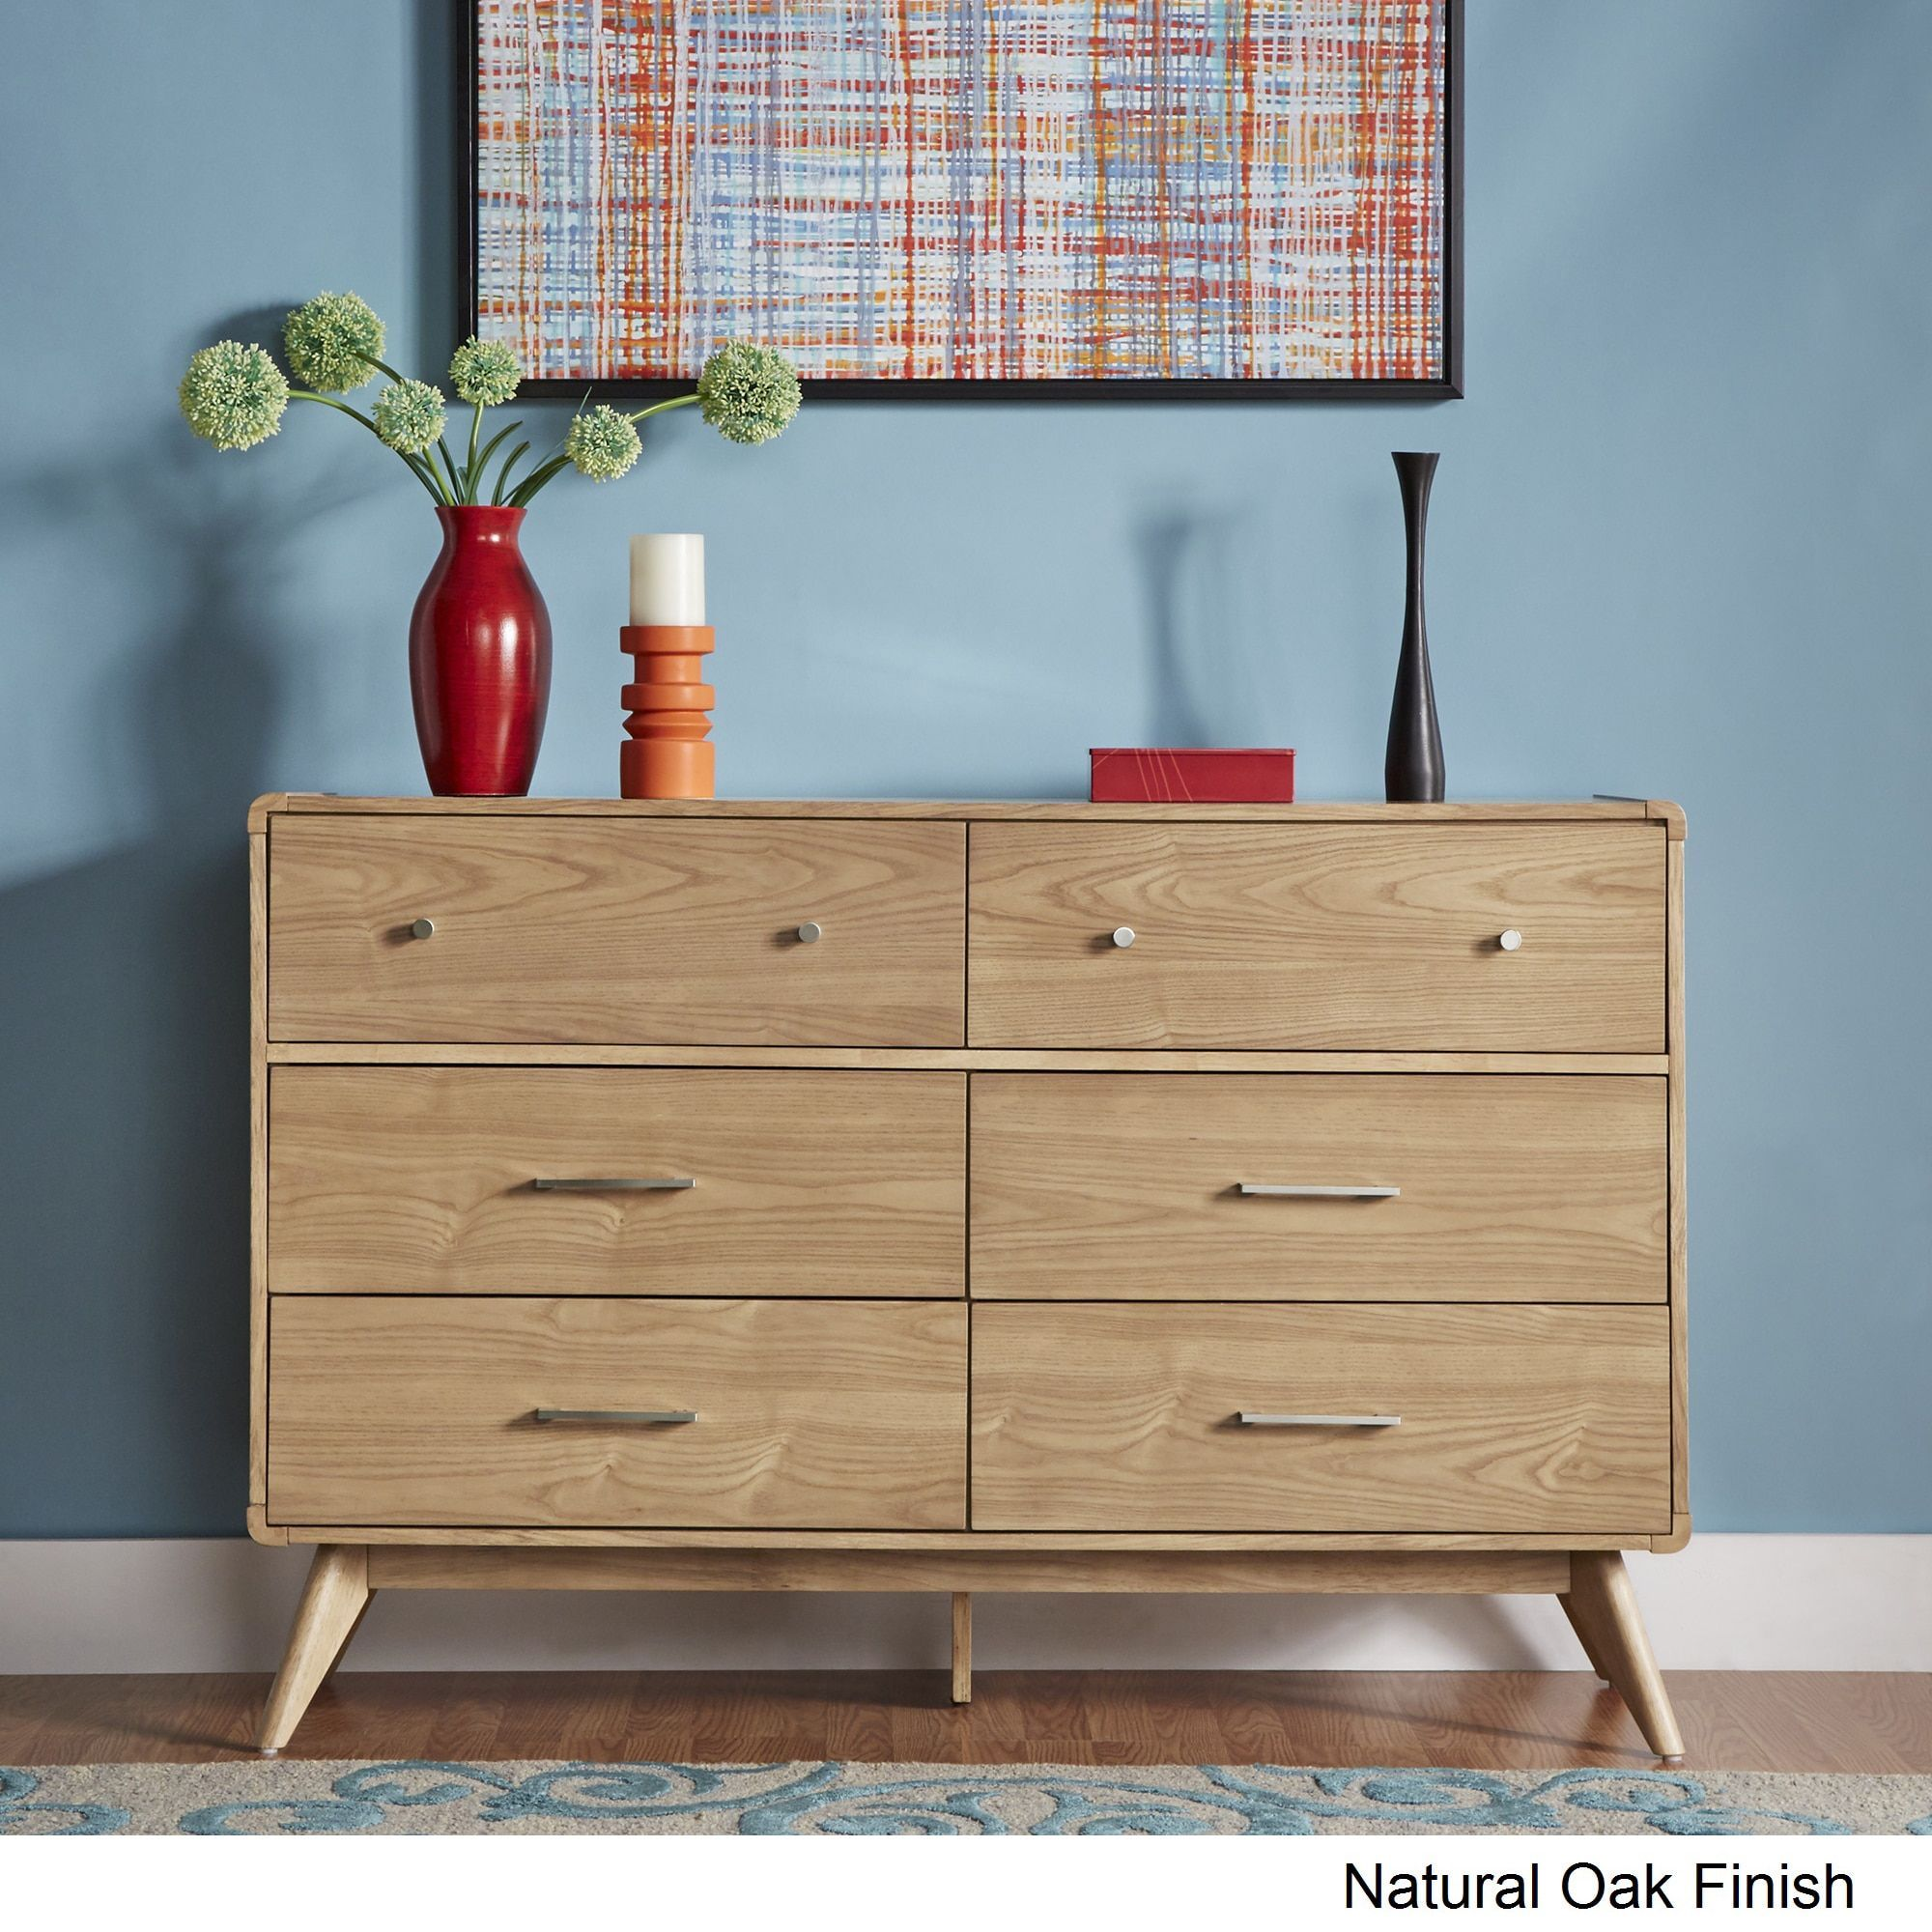 Penelope Danish Modern Curved 6-drawer Dresser iNSPIRE Q Modern (Natural  Oak Dresser Without Mirror), Brown